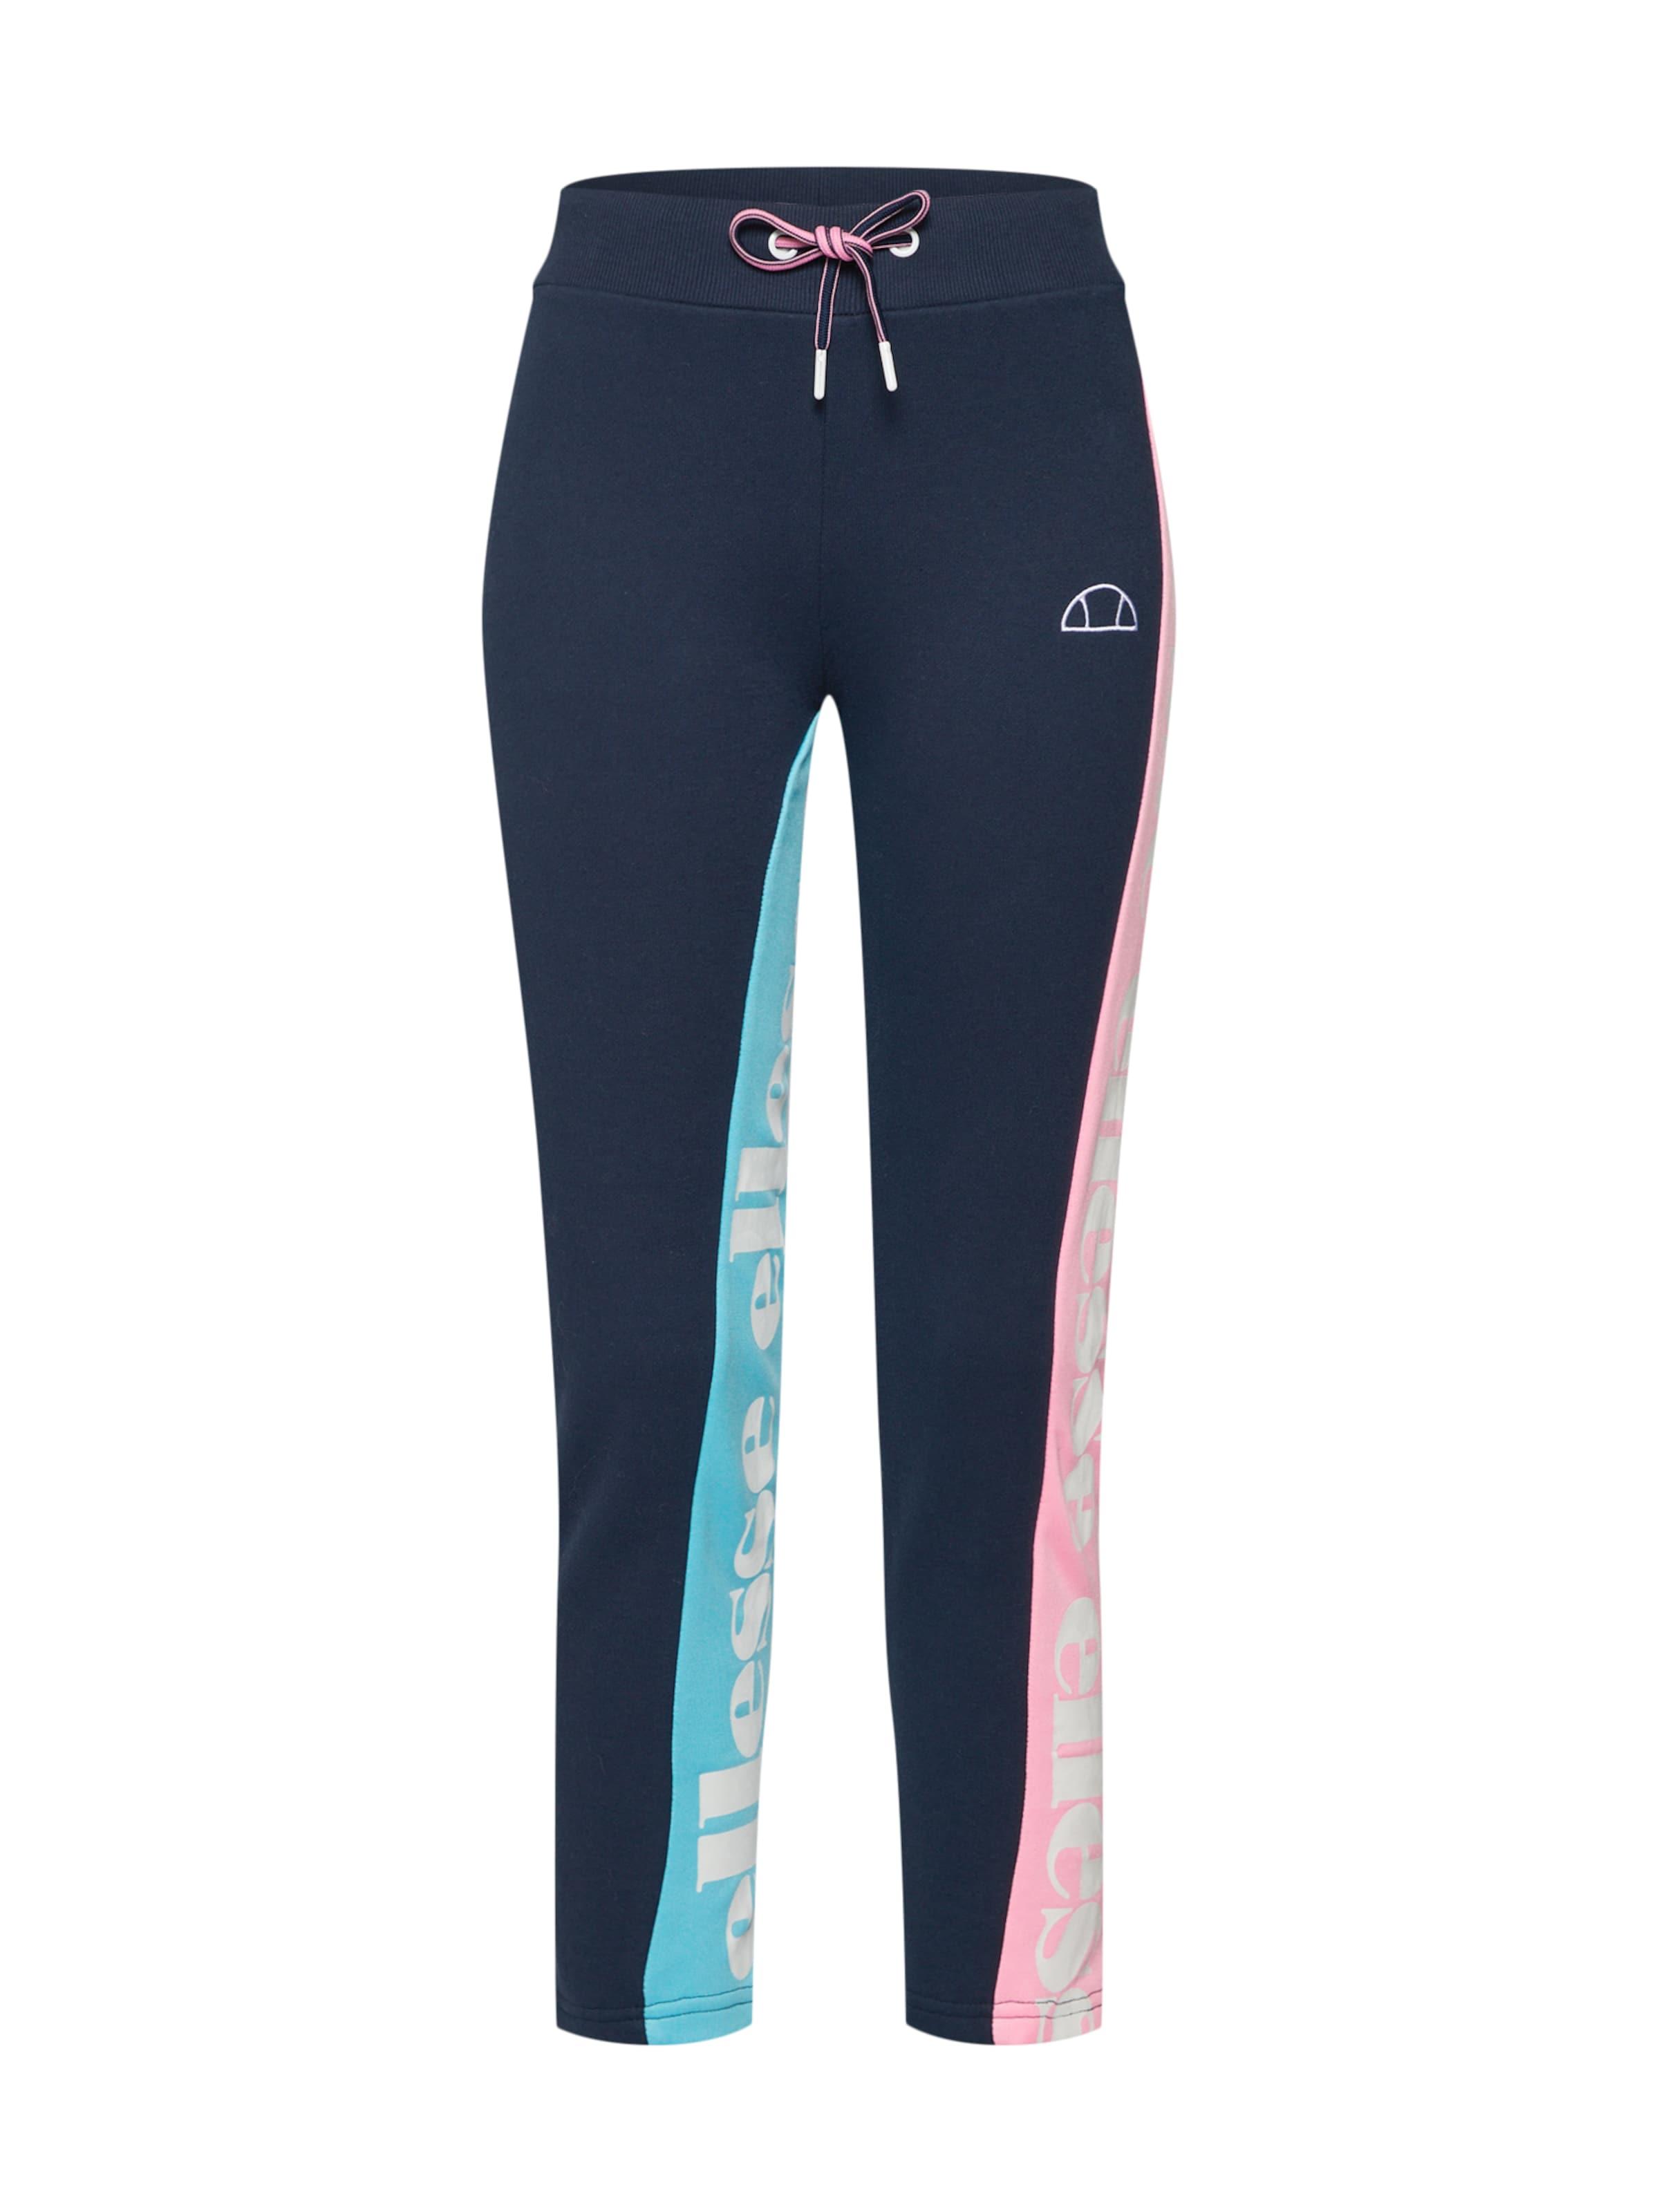 Pantalon MarineTurquoise Rose En 'botto' Bleu Ellesse BCQxeWrdo